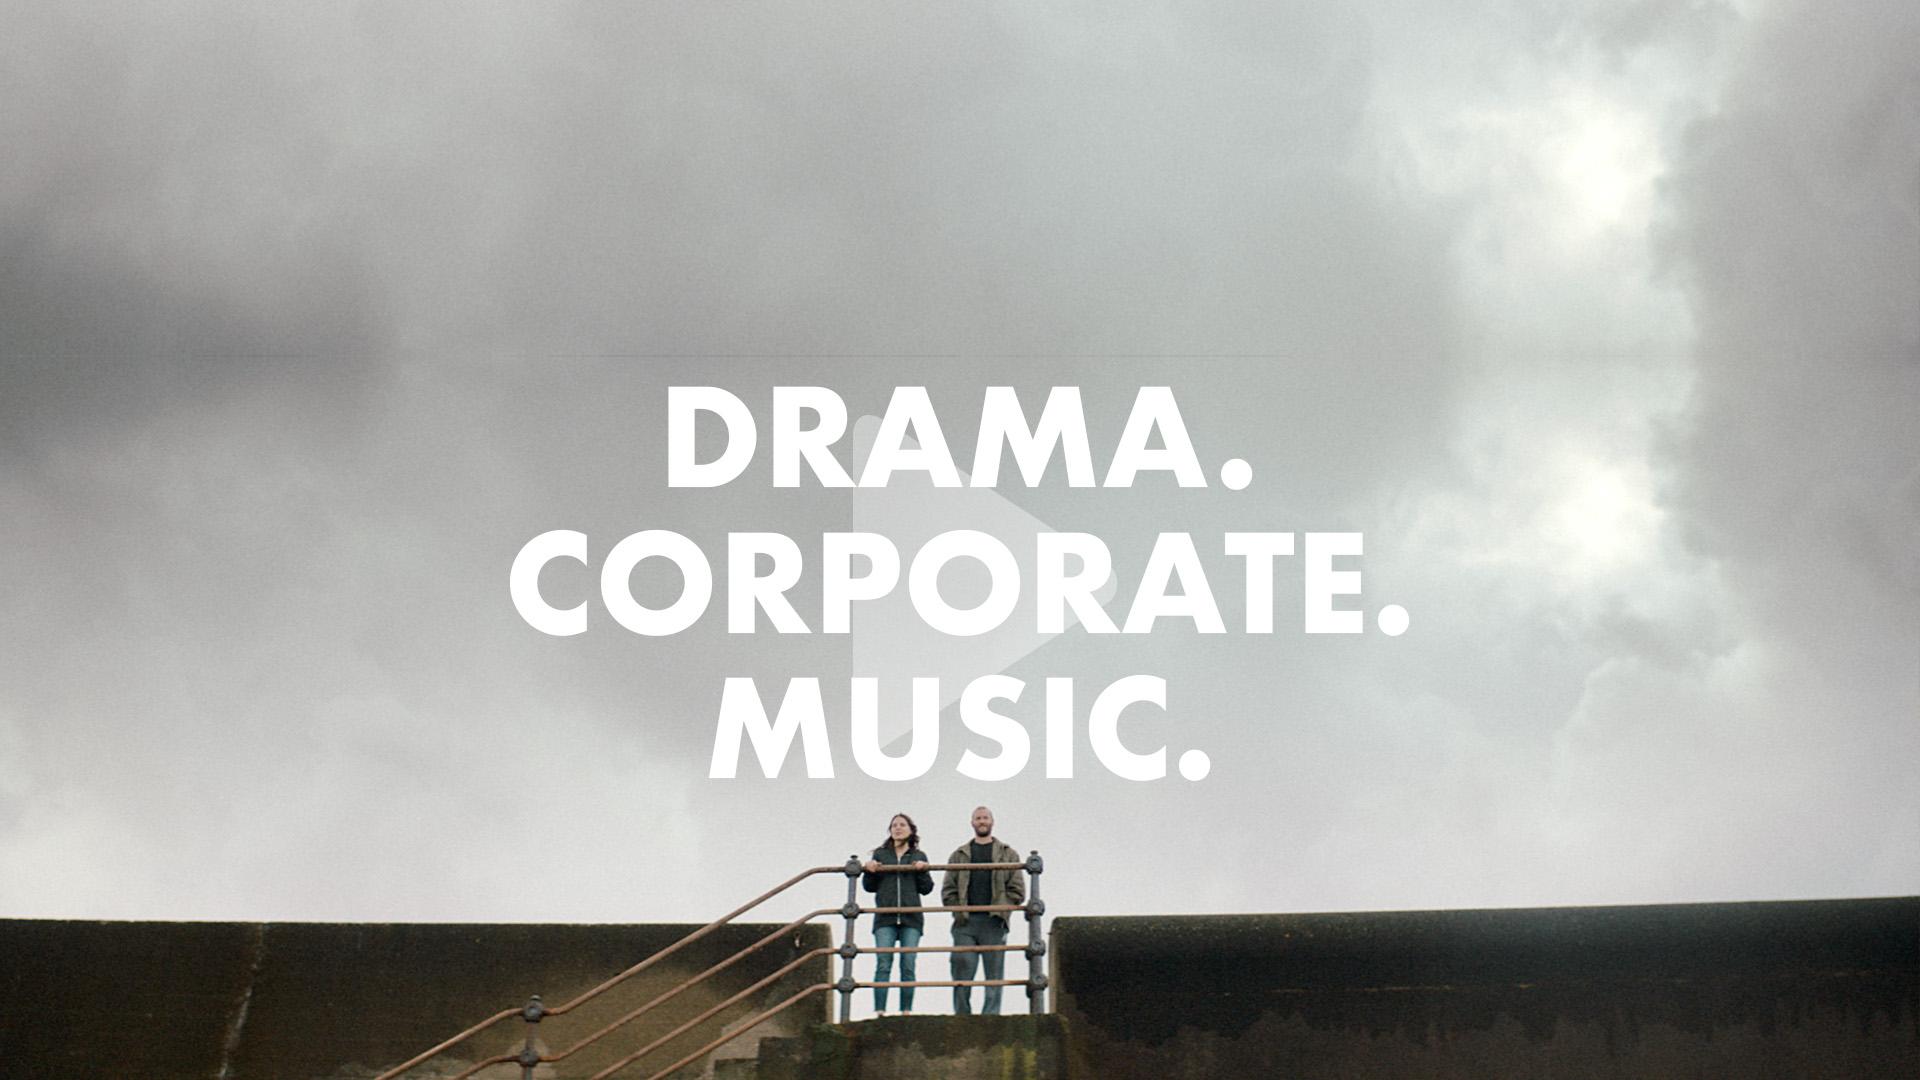 DramaCorporateMusic.jpg